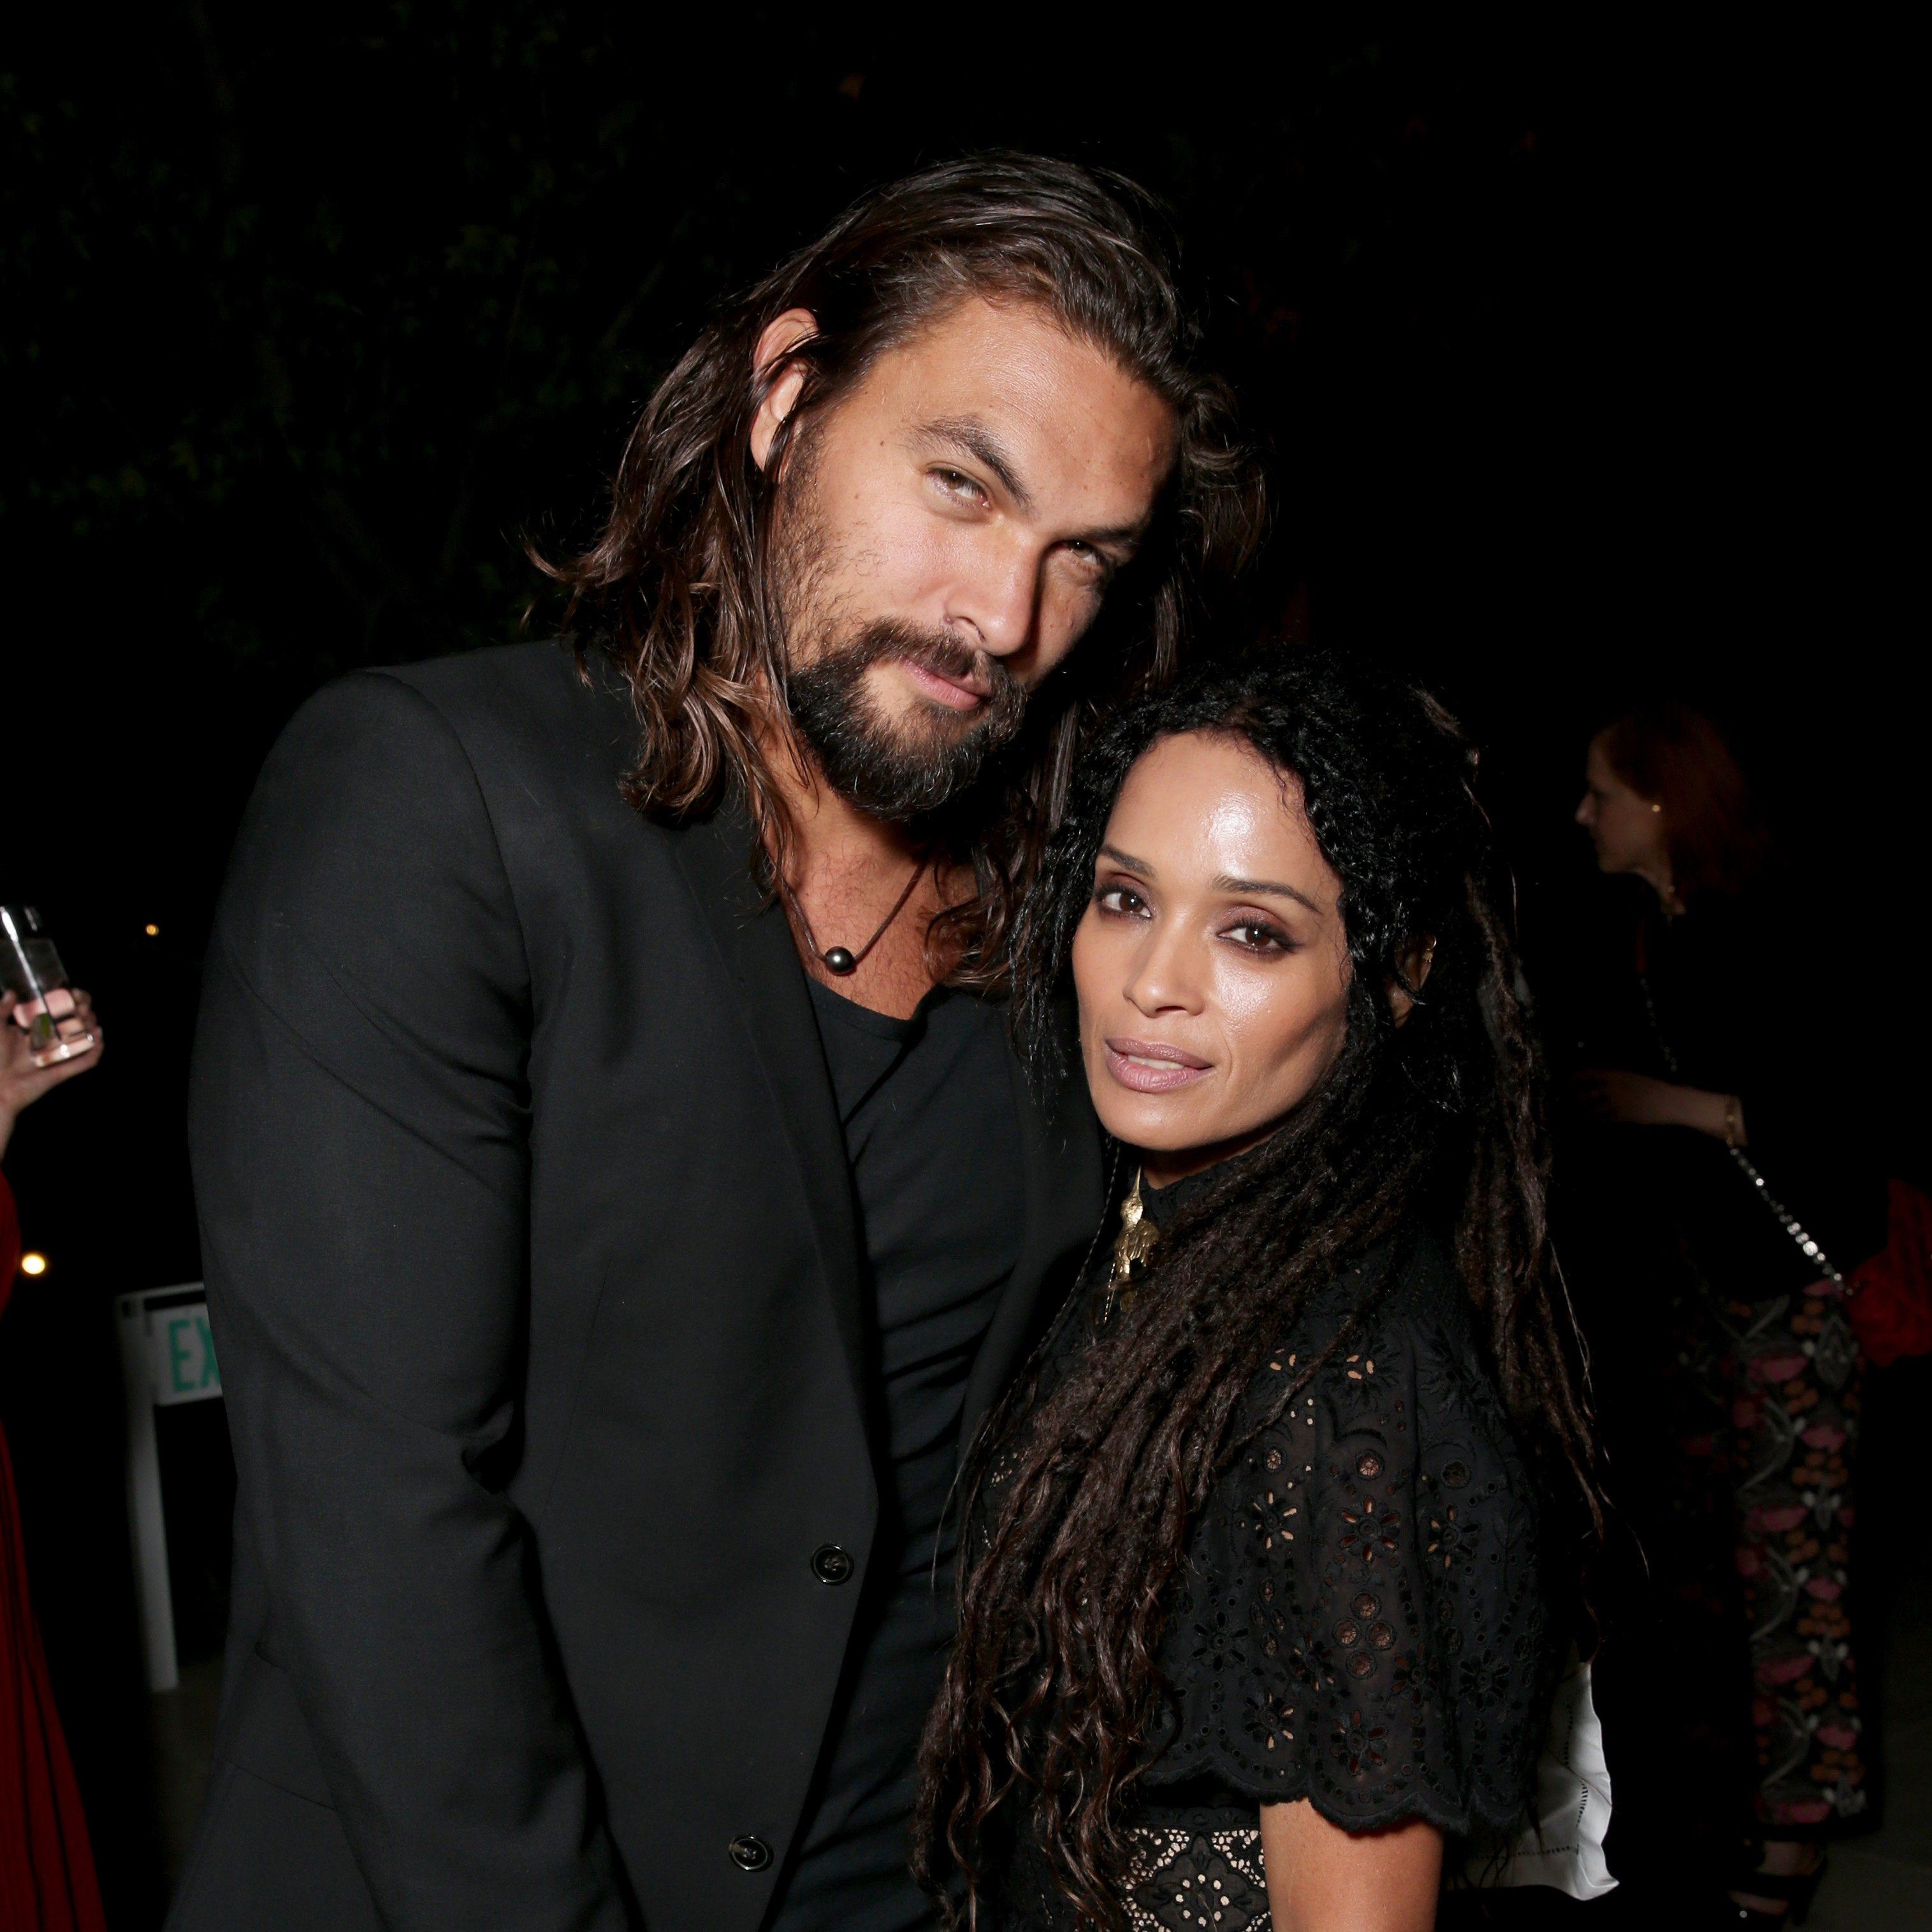 Jason Momoa Gave Aquaman Kiss For His Wife At The Movie: Lisa Bonet Surprises Husband Jason Momoa On Set For His